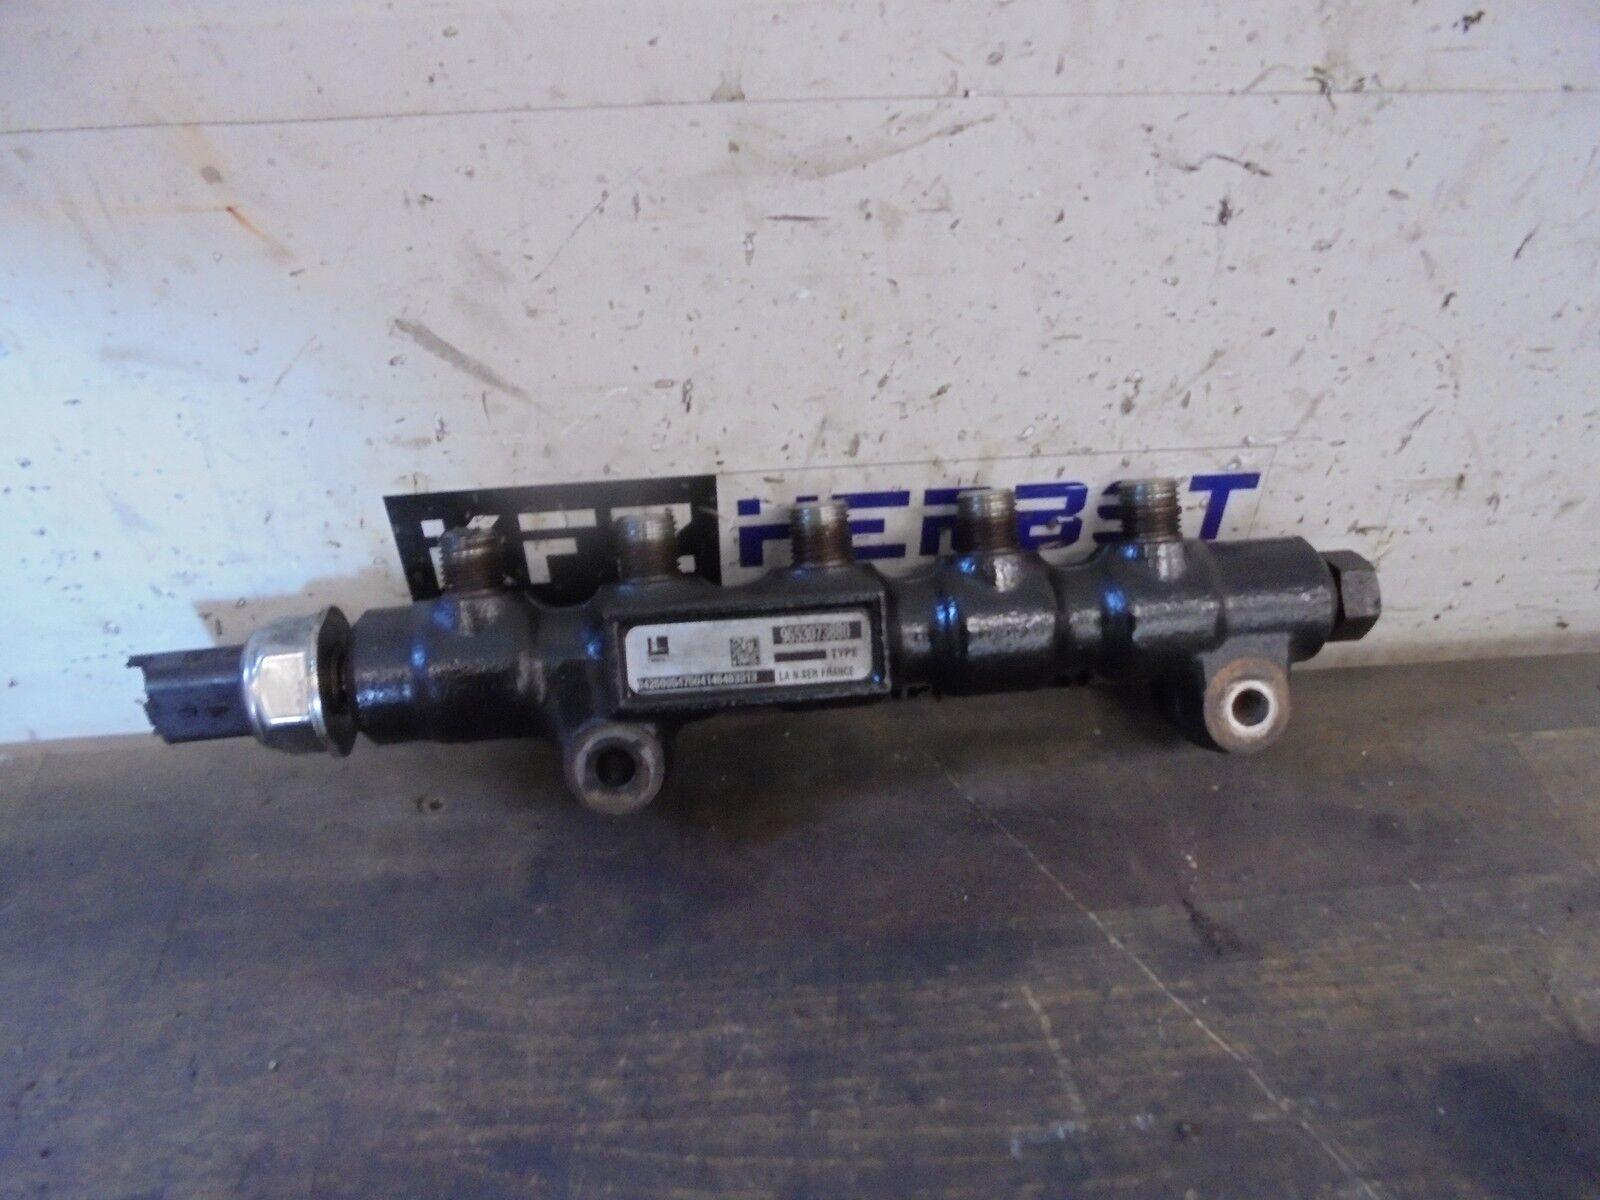 Fuel Rail Suzuki Liana Er 9653073880 14 Ddis 66kw 8hy 130528 Ebay Timing Belt For Norton Secured Powered By Verisign